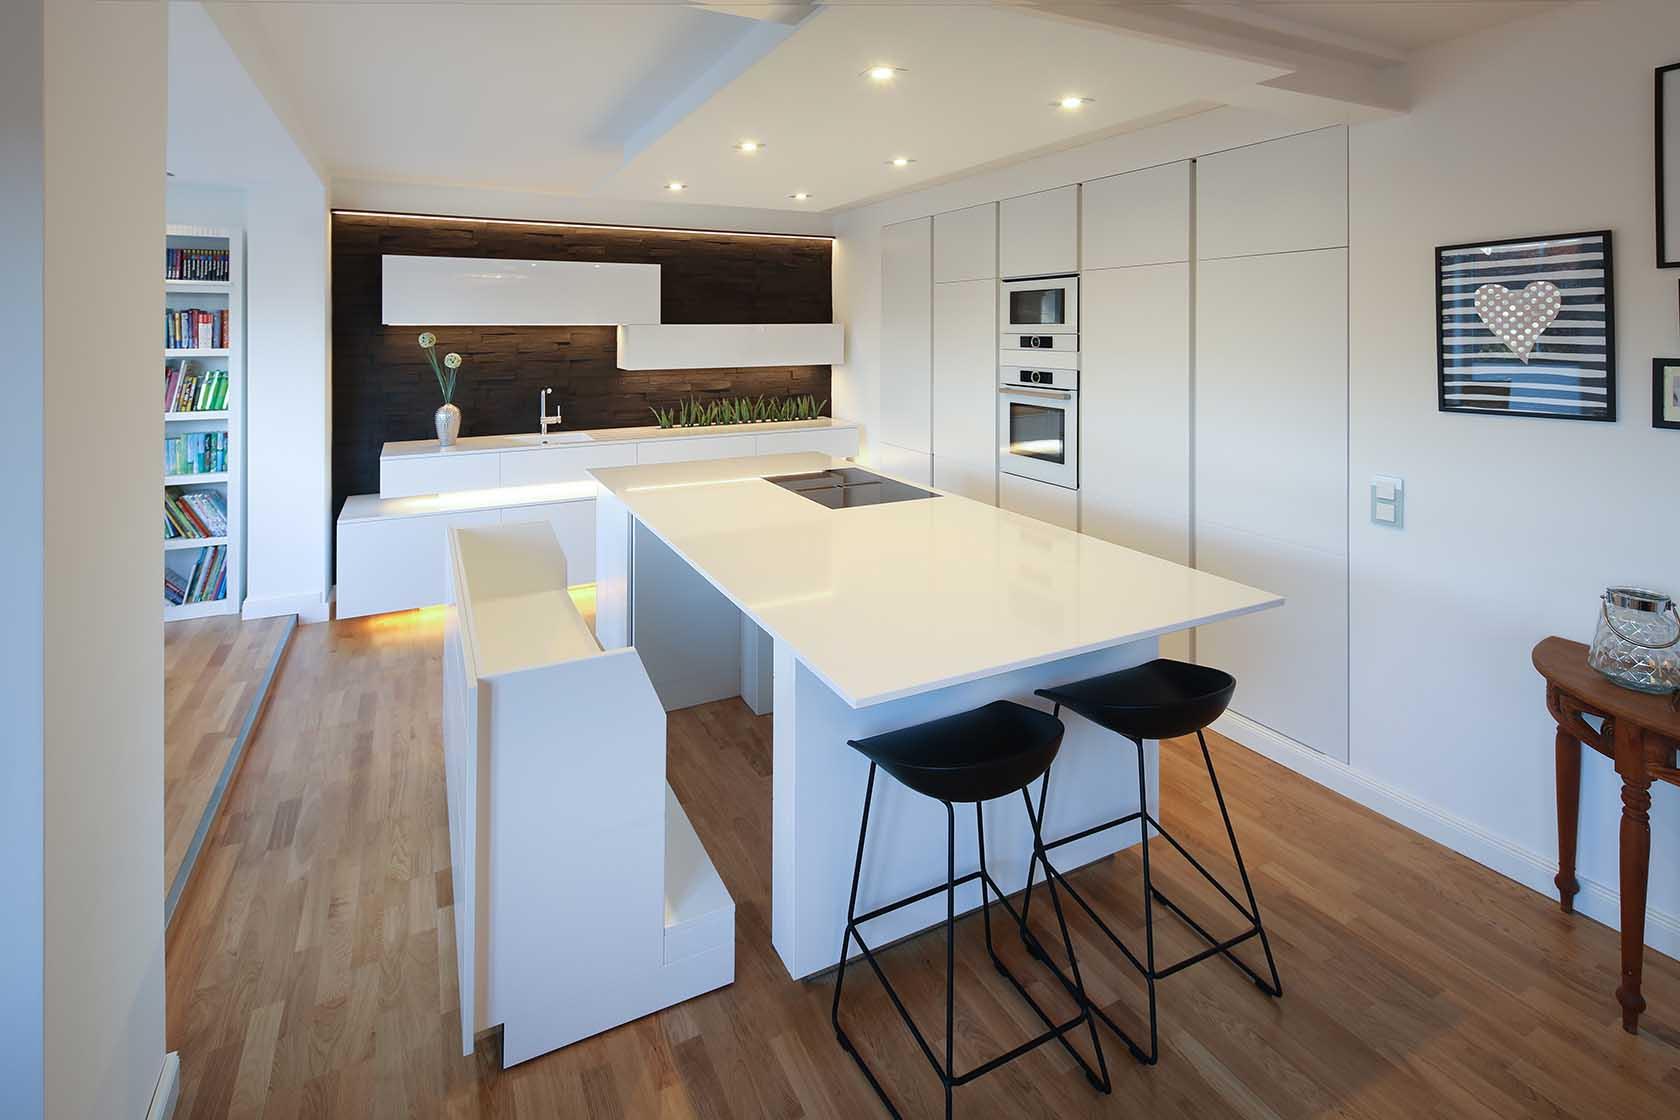 Full Size of Küche Selber Planen Günstige Küche Selber Planen Küche Selber Planen Und Bestellen Küche Selber Planen Online Küche Küche Selber Planen